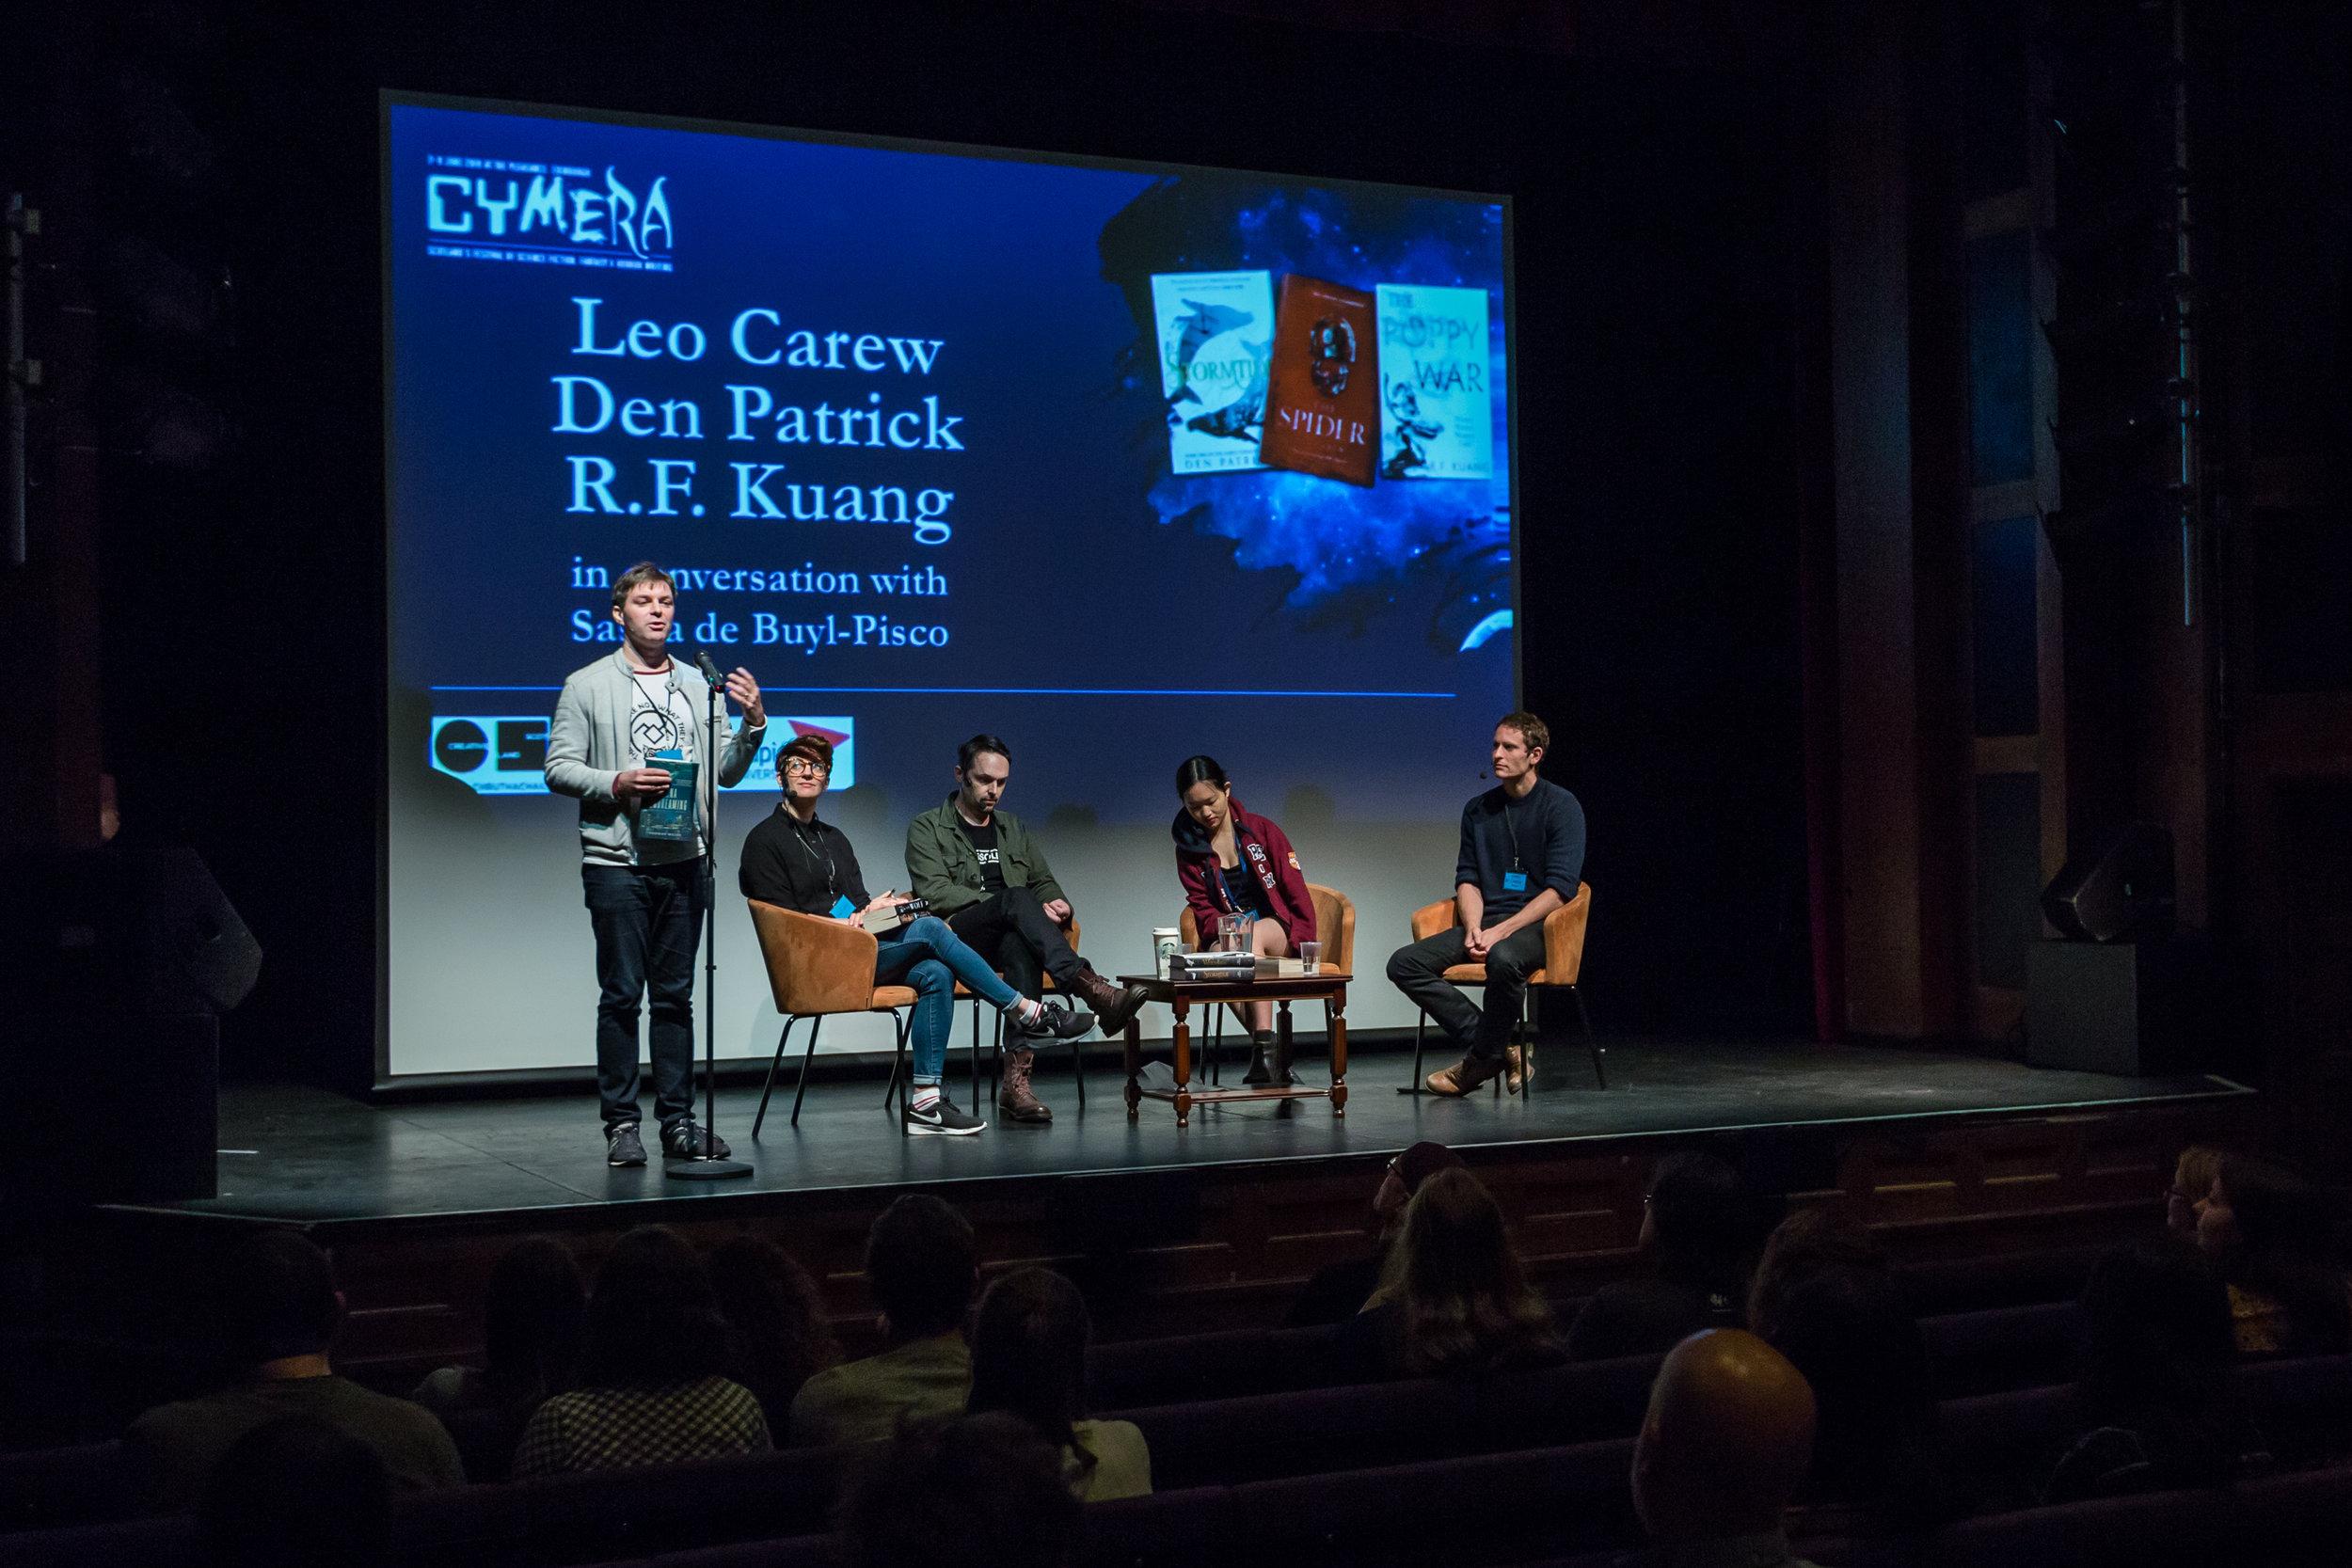 L-R  Thomas Welsh, Sasha De Buyl, Den Patrick, R.F. Kuang and Leo Carew  Photo credit: Chris Scott